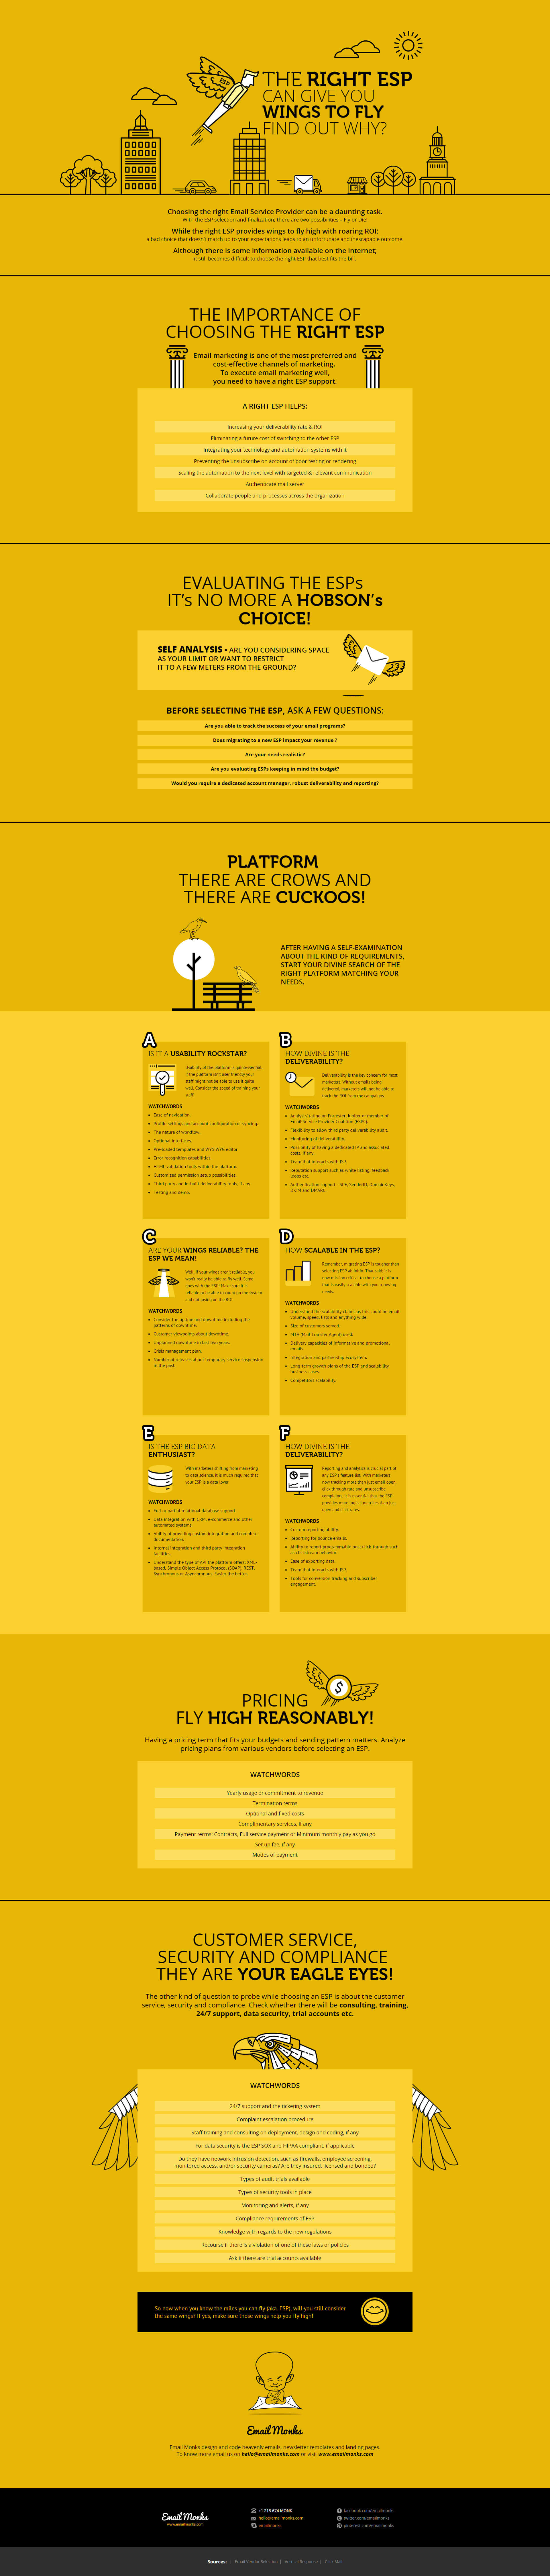 checklist for choosing an esp- infographic